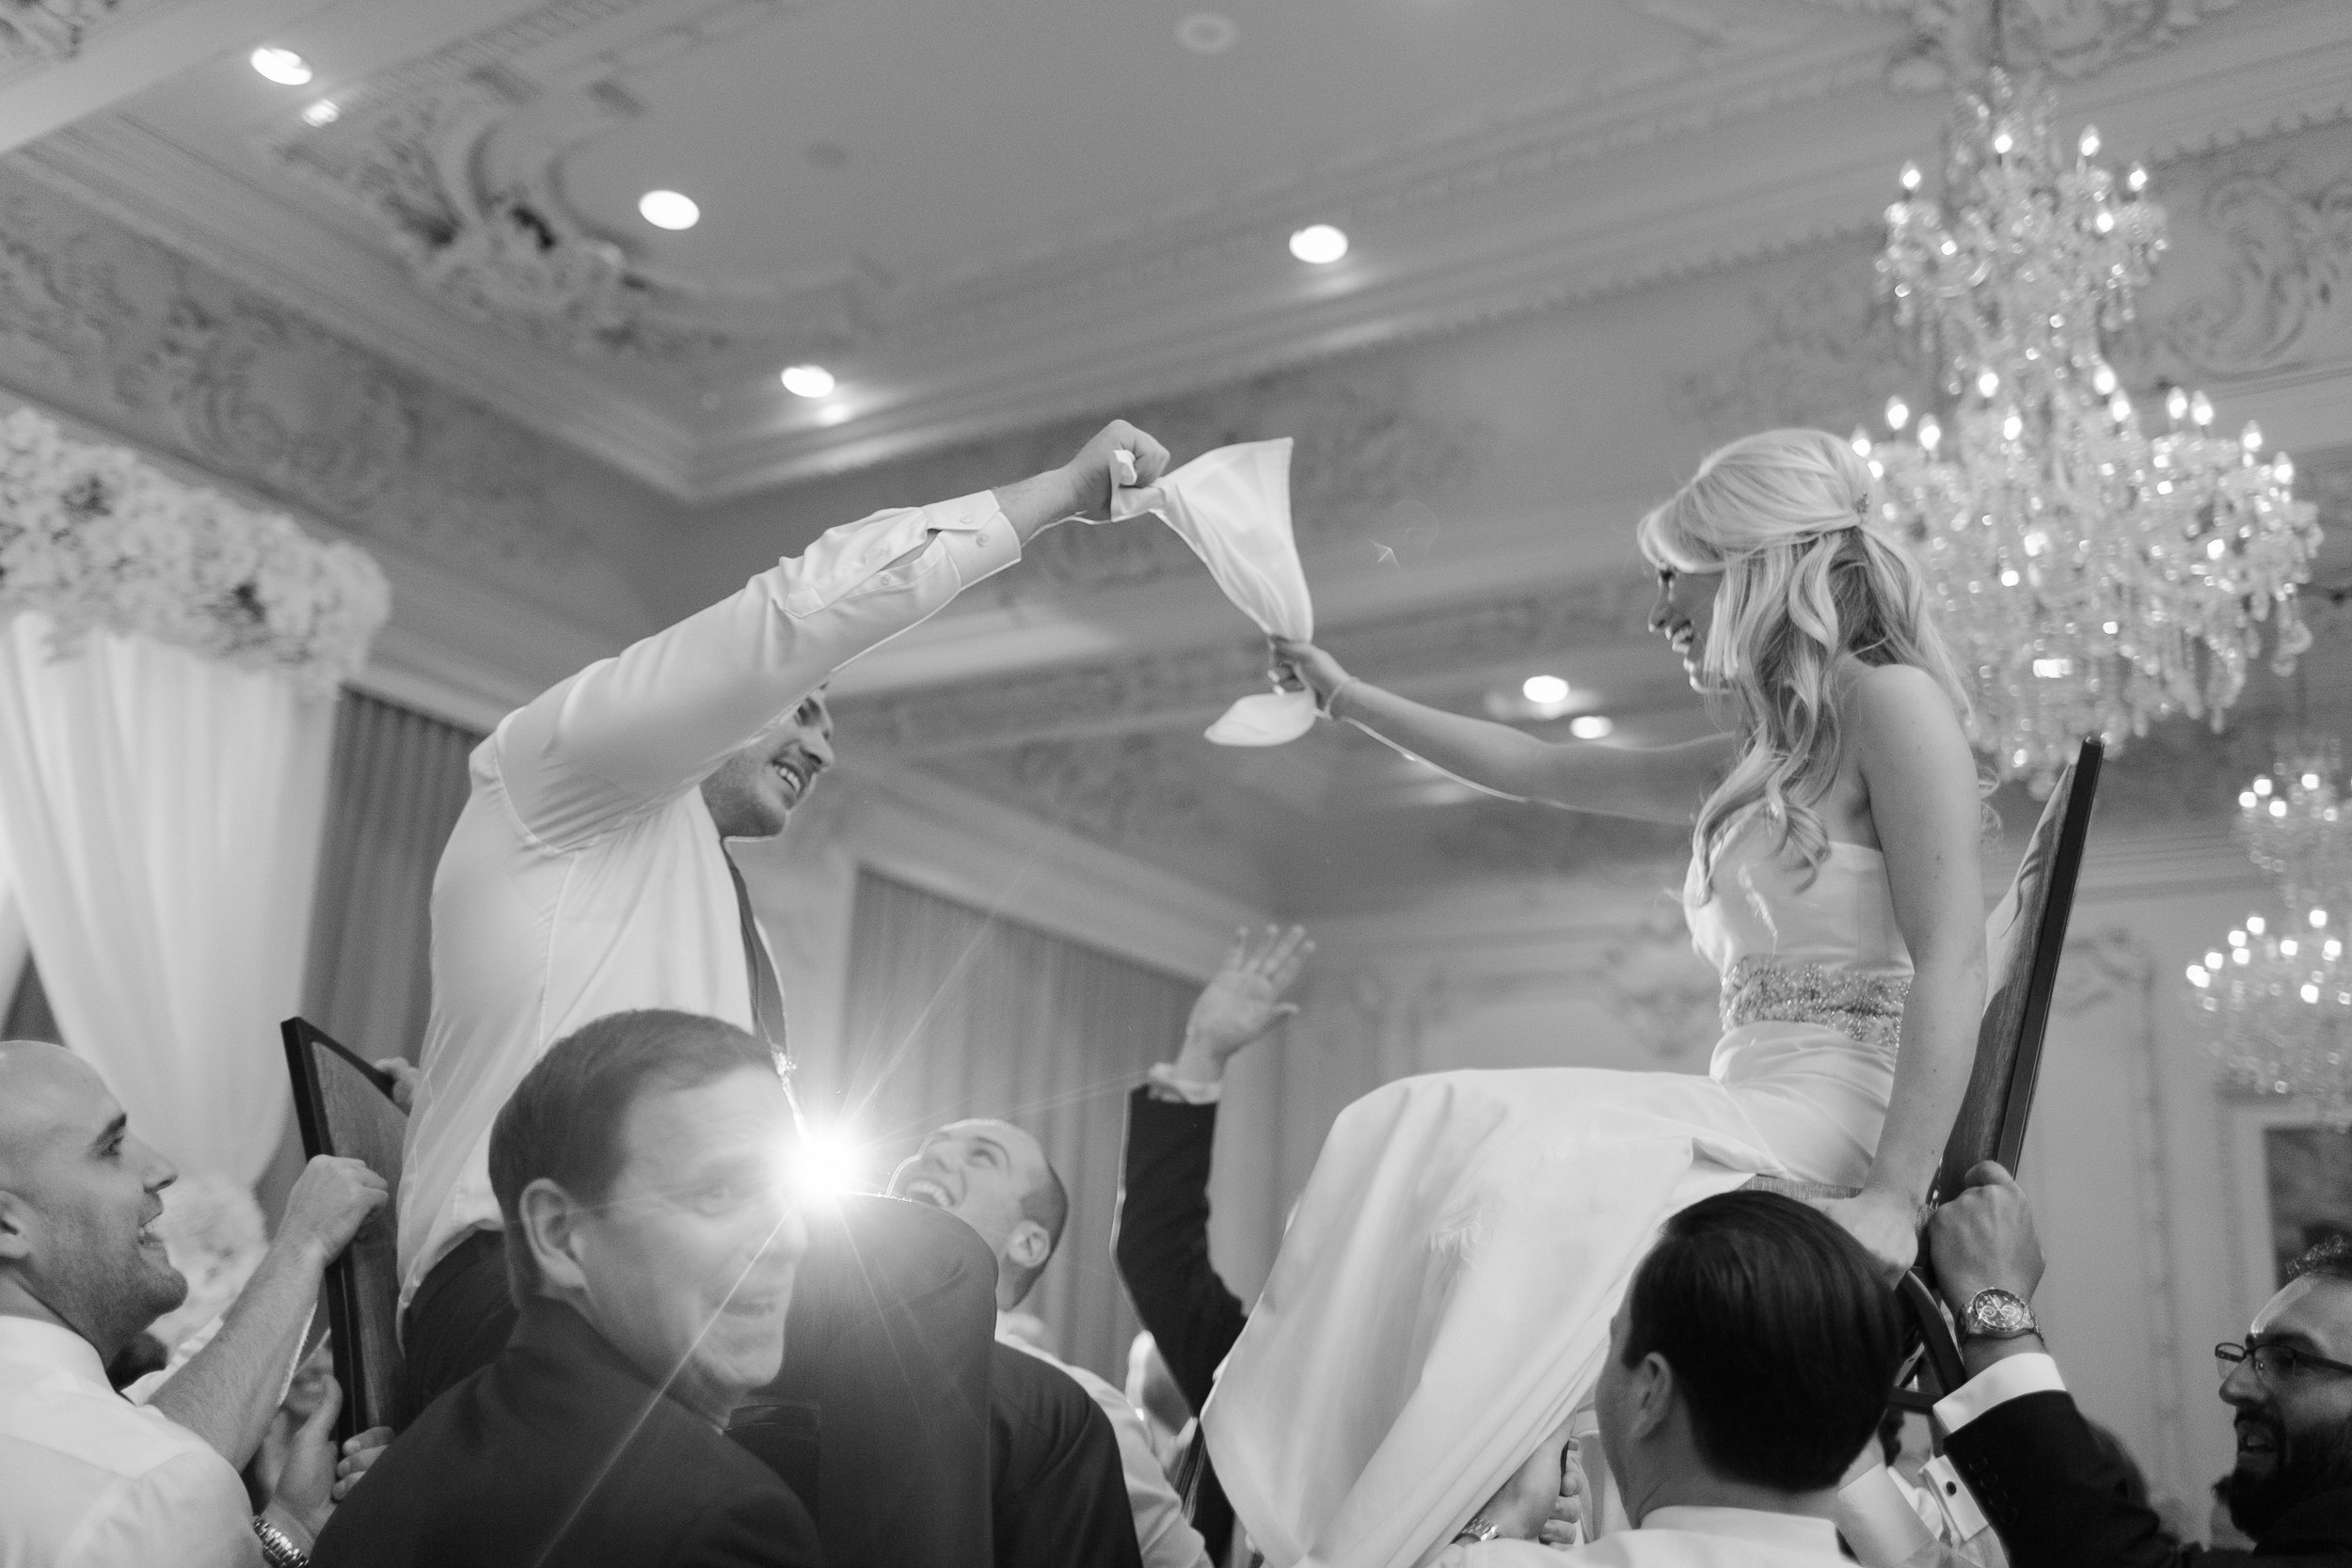 king-edward-hotel-wedding-toronto-ontario-high-end-photographer-richelle-hunter-linds-jarrett-728 copy.jpg